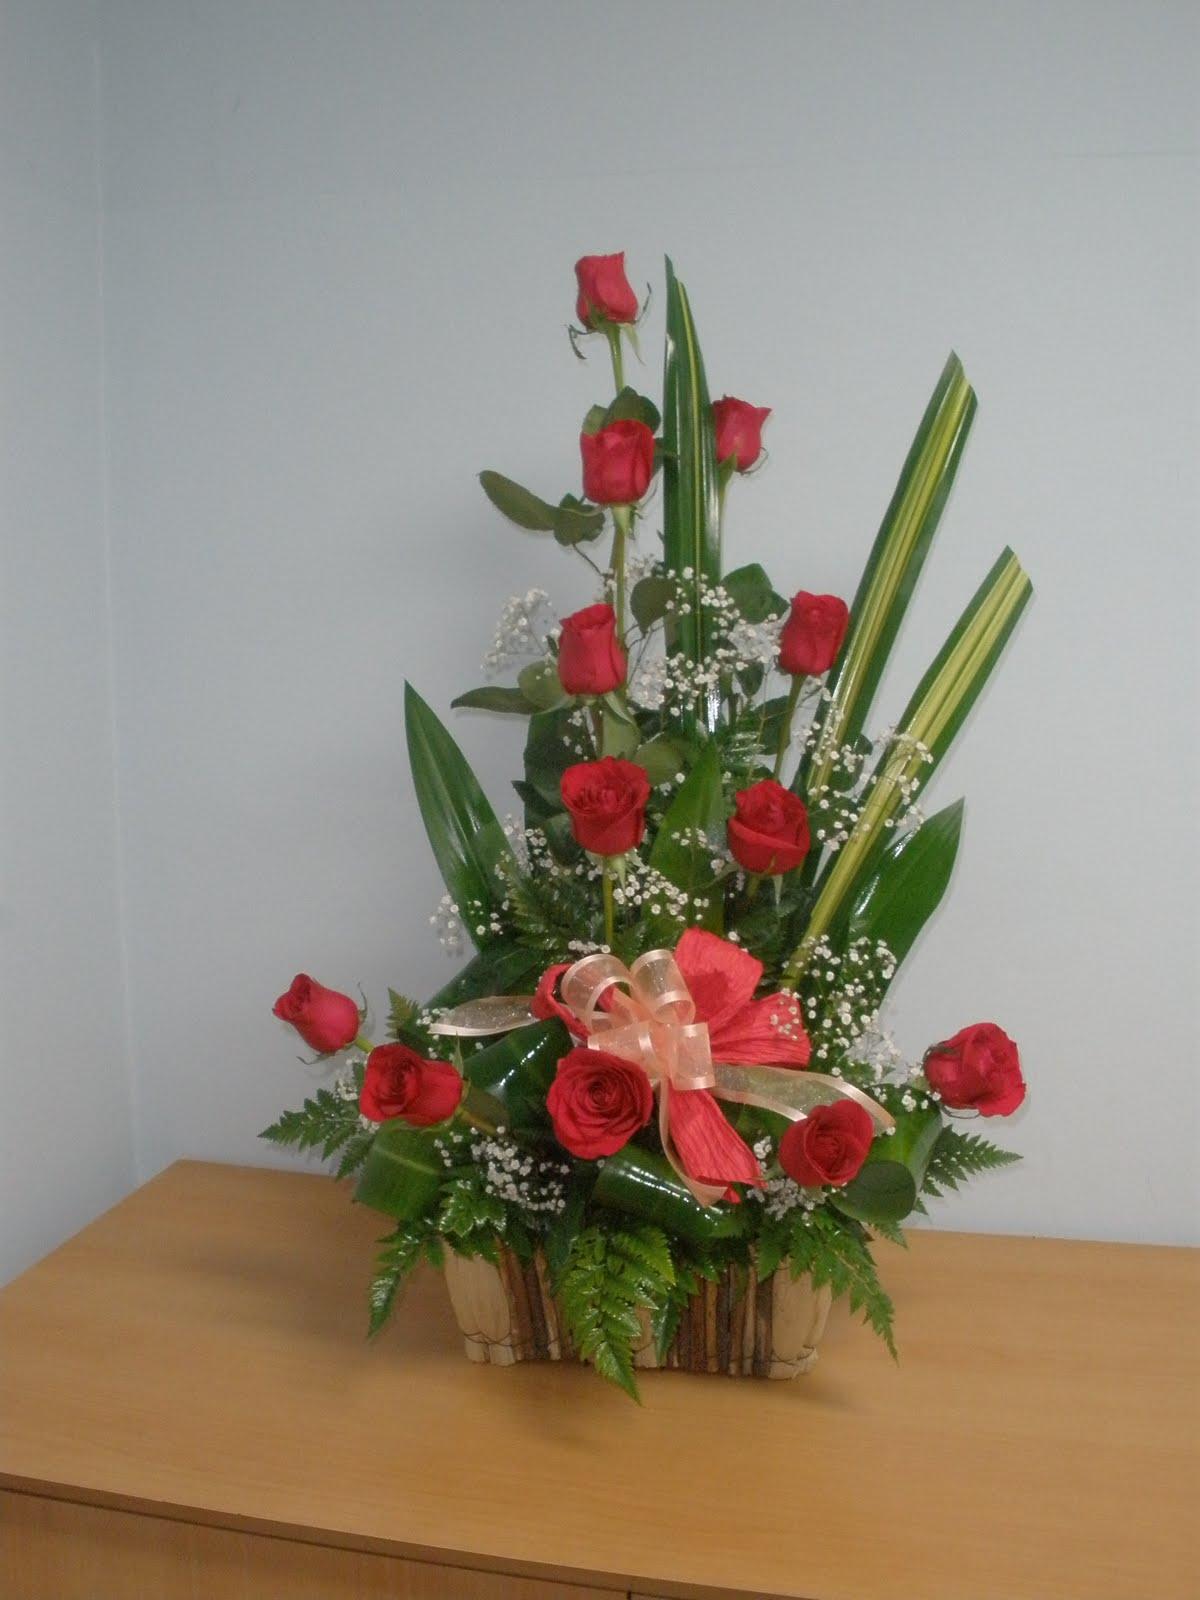 Arreglos de flores naturales auto design tech - Arreglo de flores naturales ...